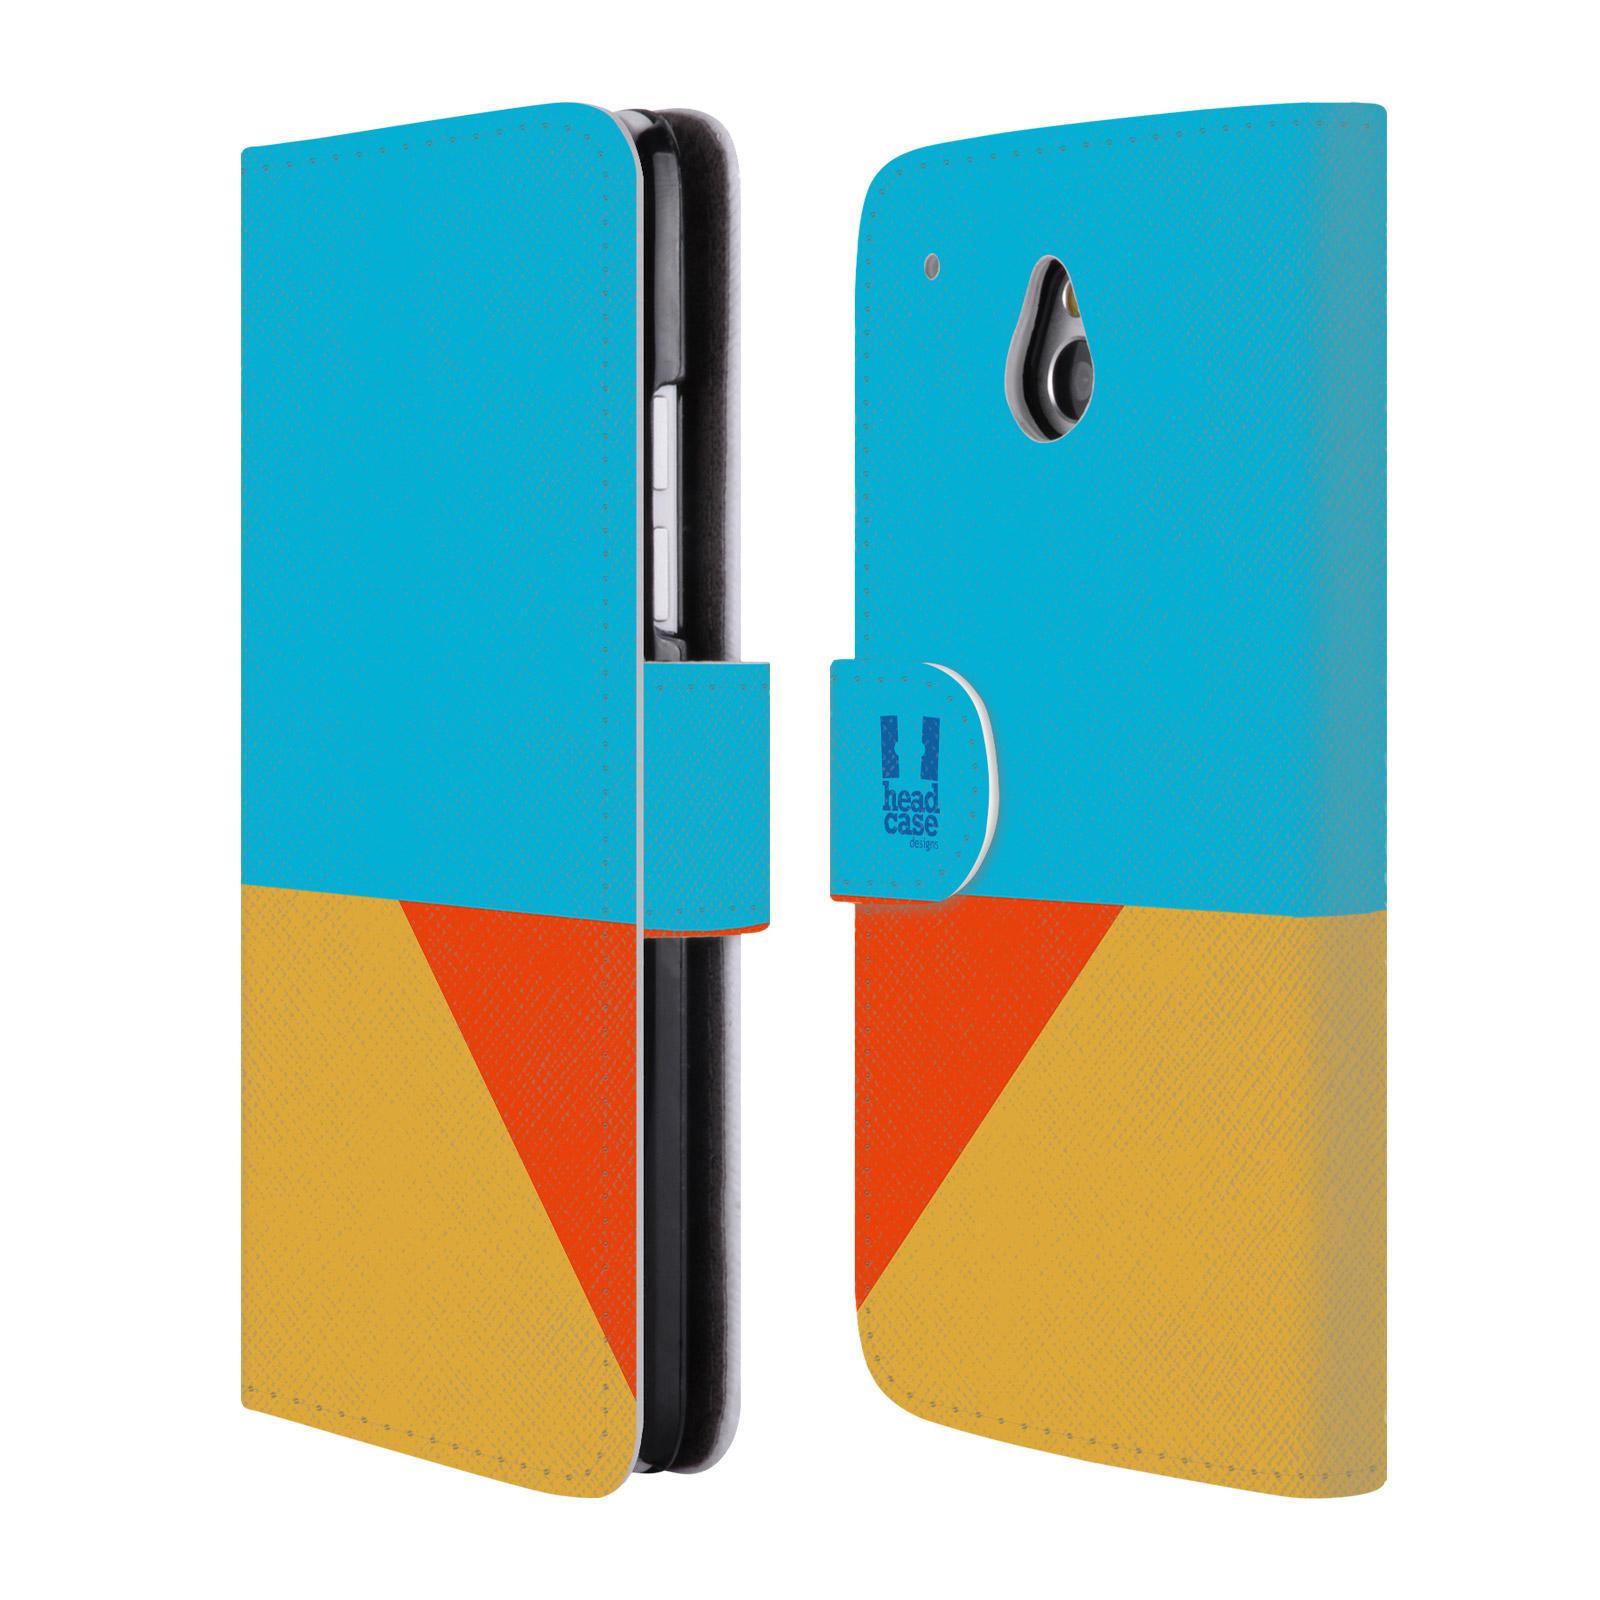 HEAD CASE Flipové pouzdro pro mobil HTC ONE MINI barevné tvary béžová a modrá DAY WEAR